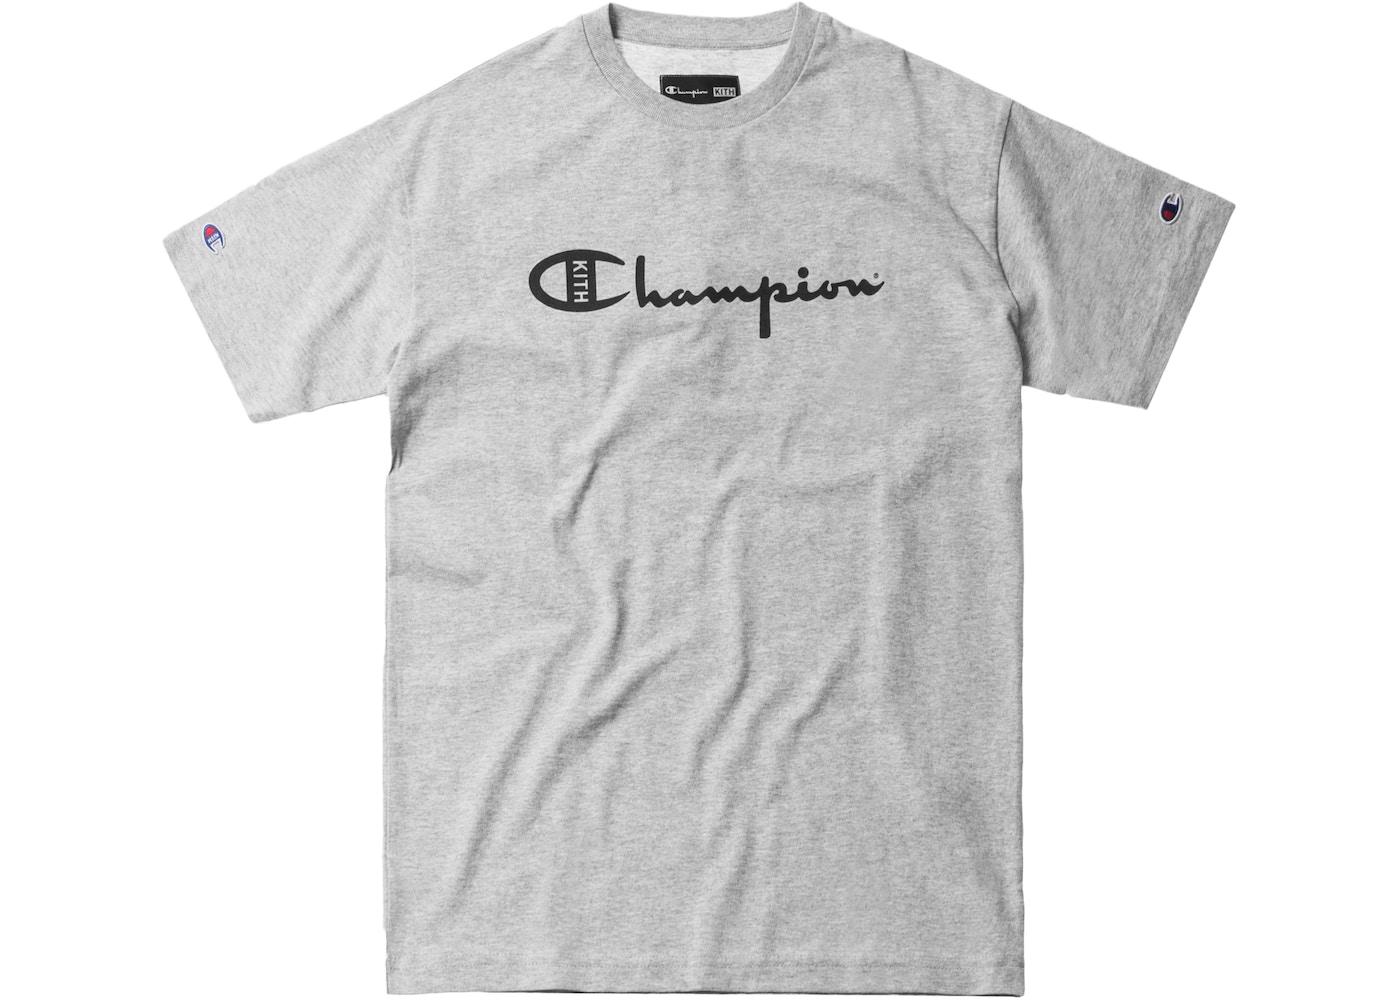 81a4e938d6895e Sell. or Ask. Size L. View All Bids. Kith Champion Script Logo Tee Heather  Grey